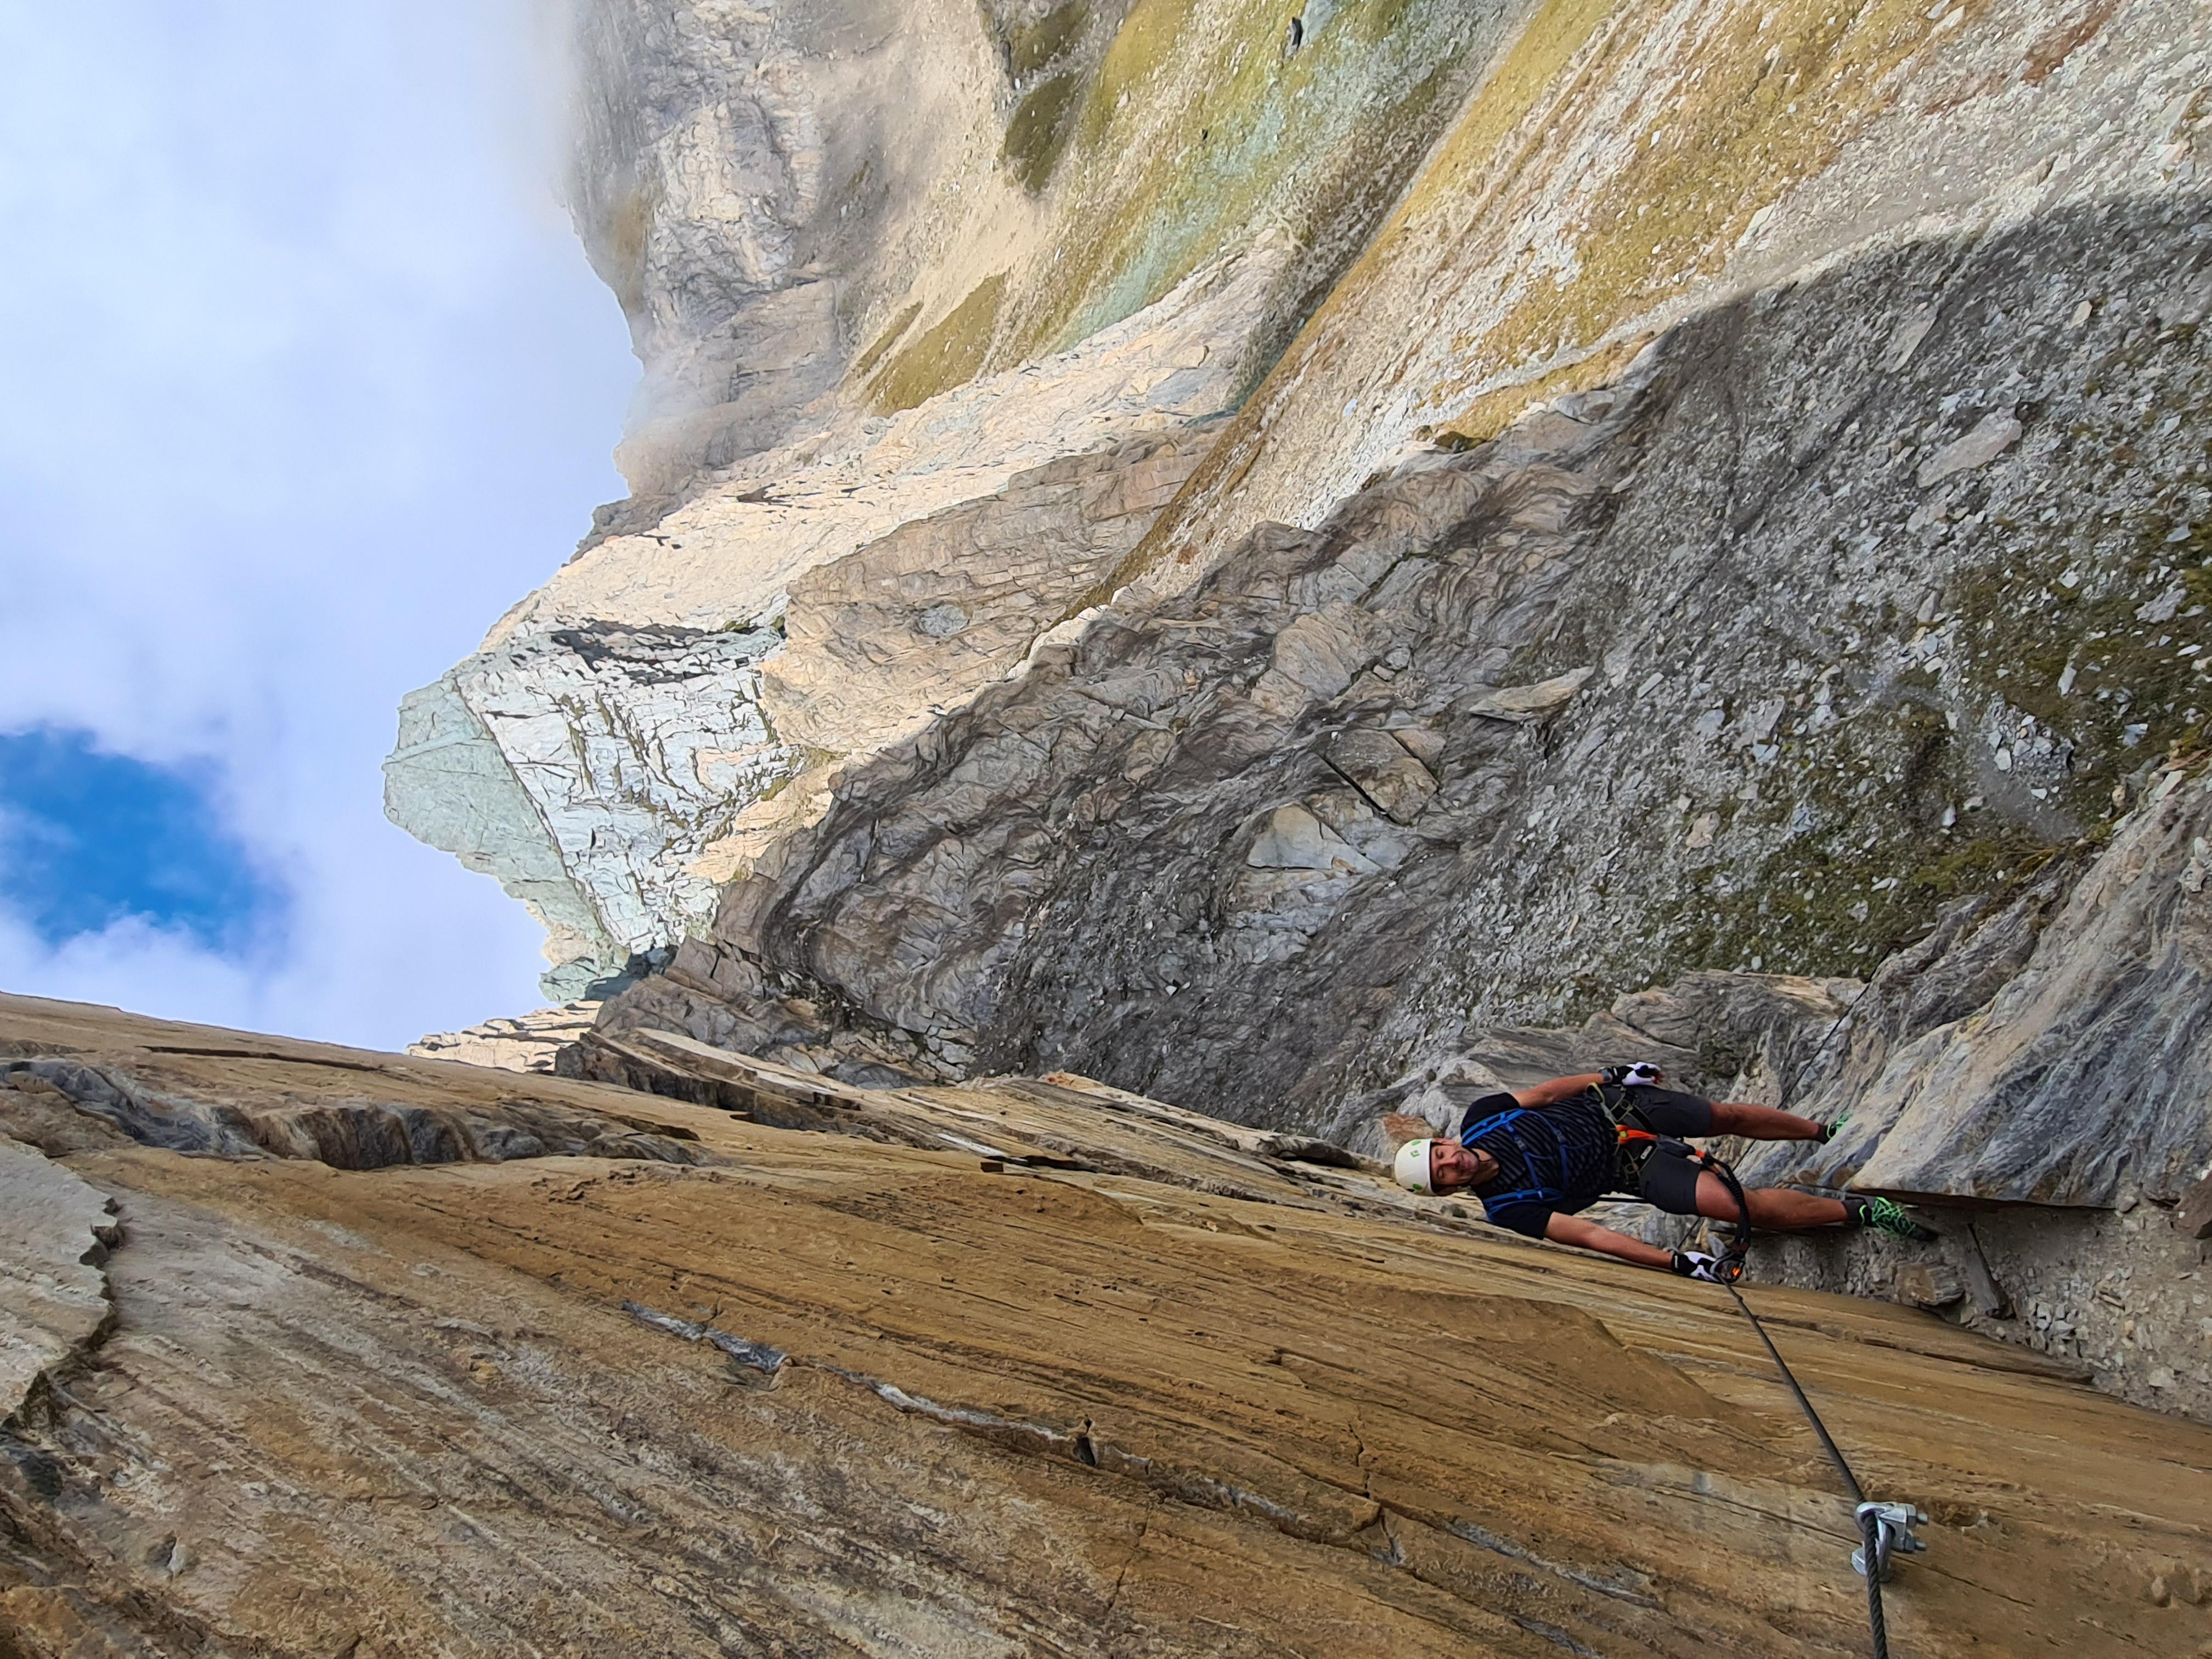 Osttiroler Klettersteig Rote Säule Virgental